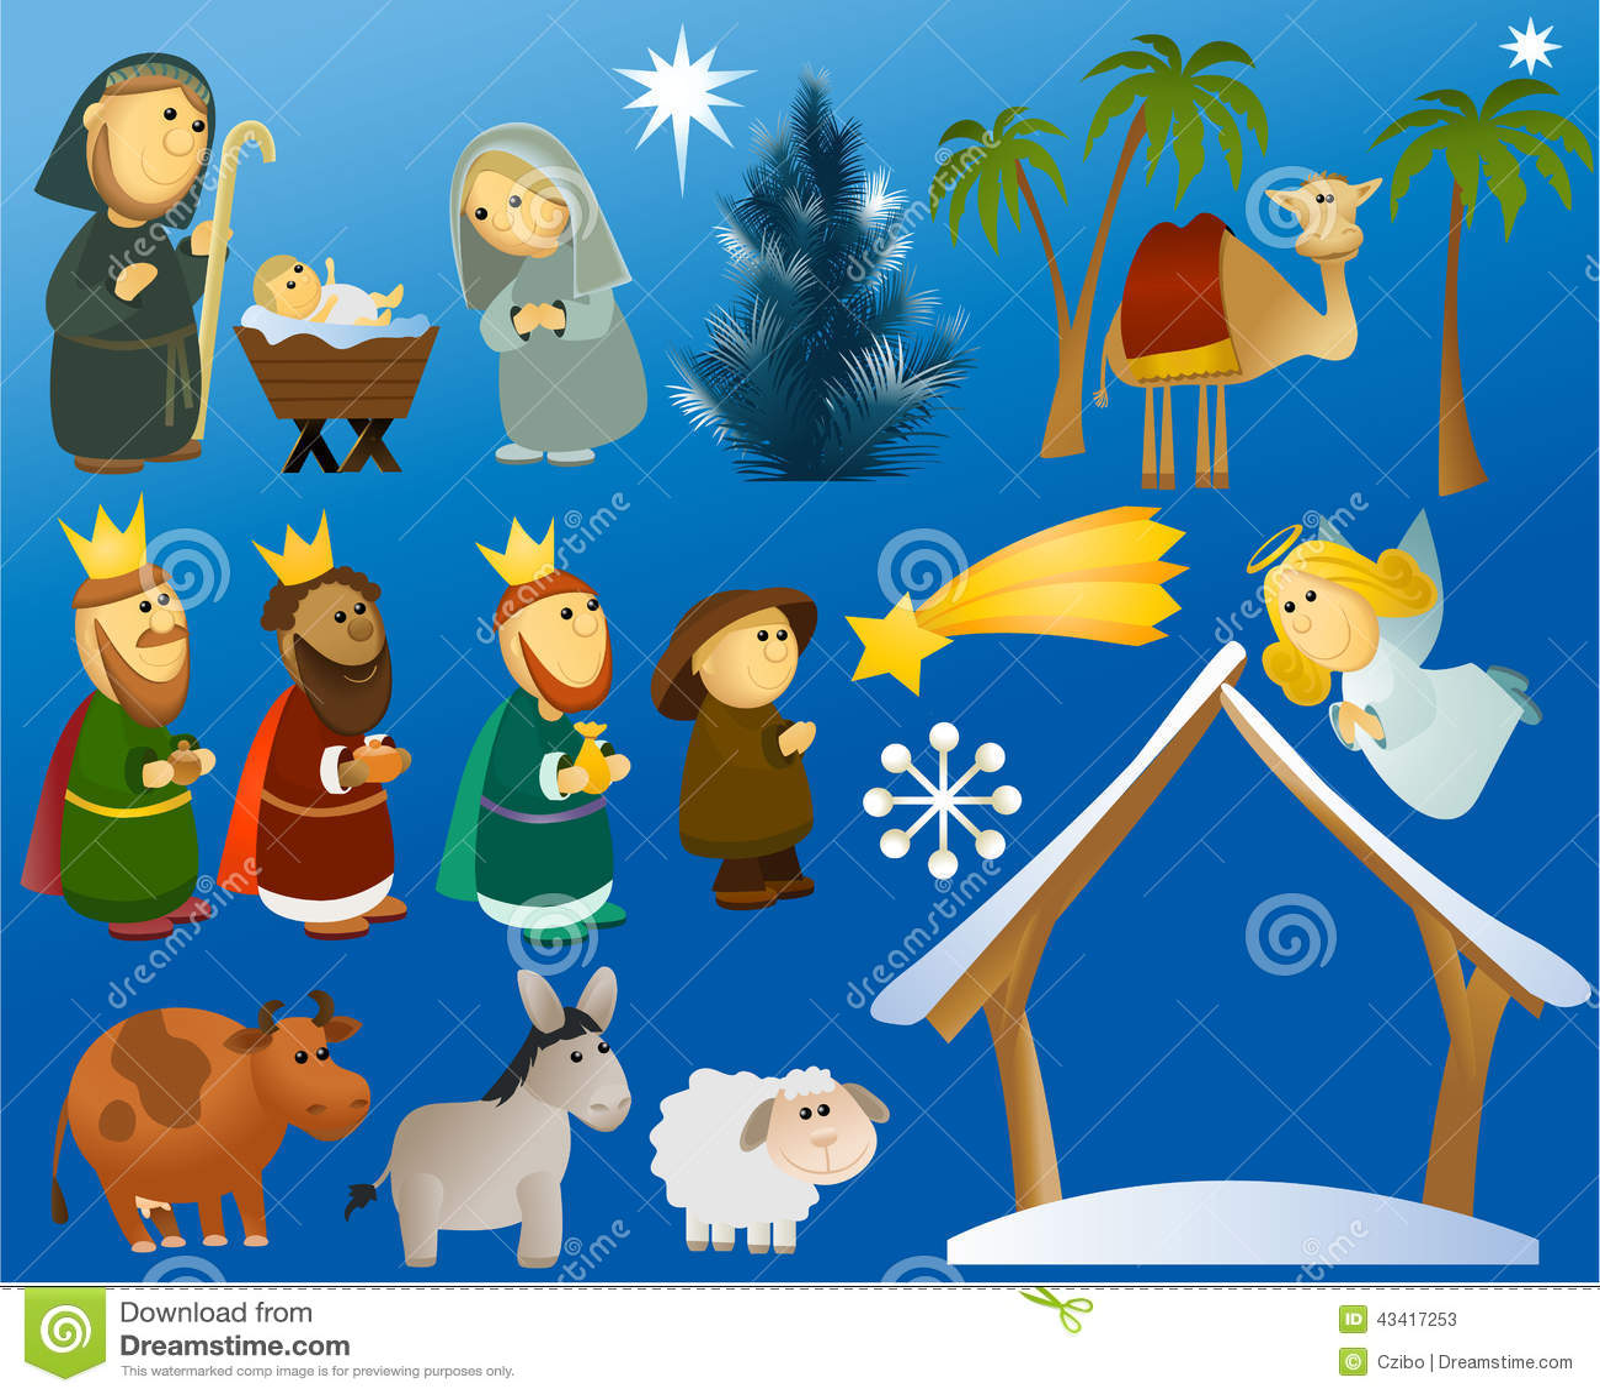 Set Of Christmas Scene Elements Stock Vector - Image: 43417253